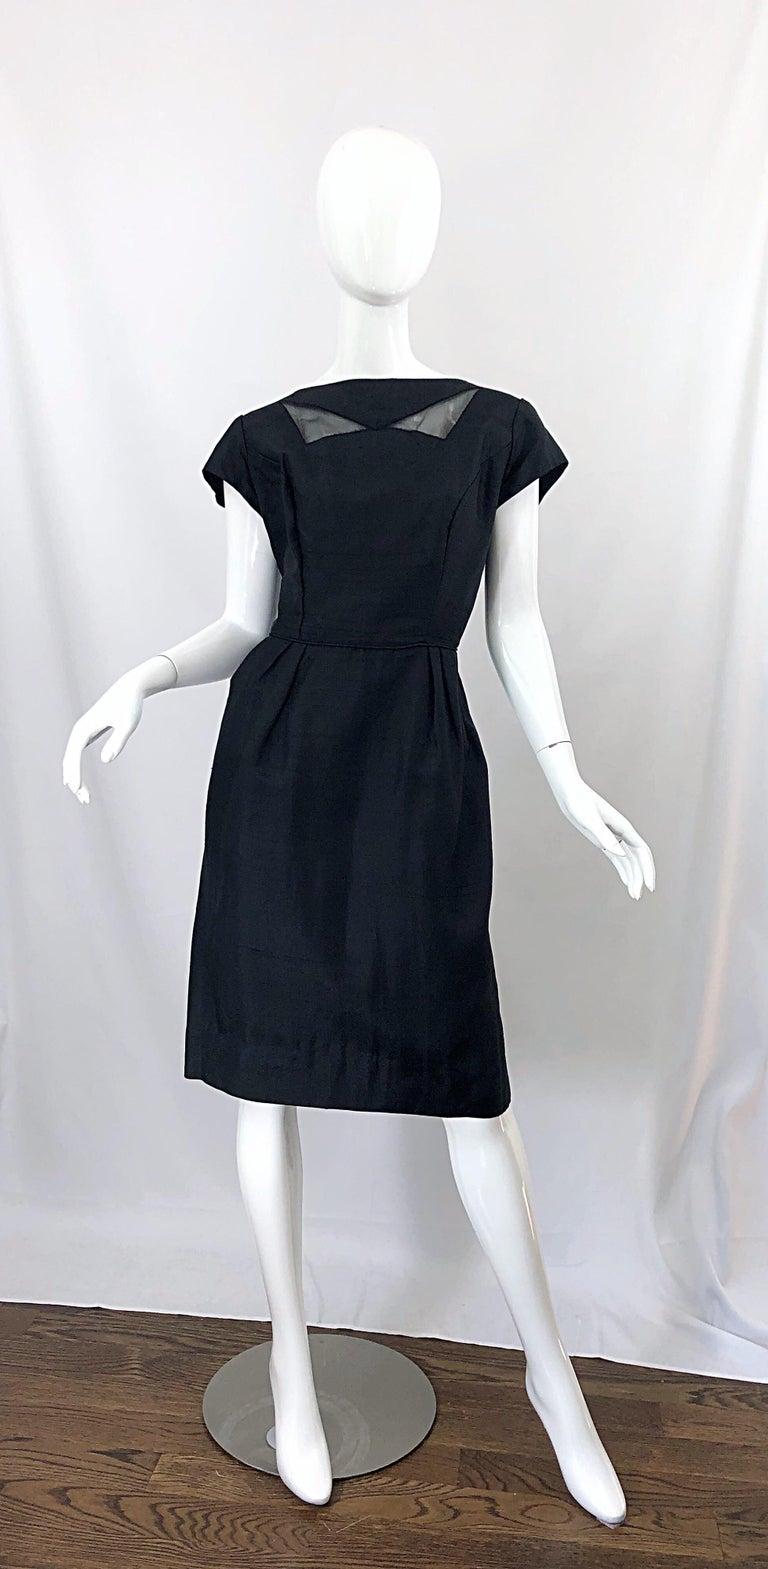 1950s Demi Couture Black Silk Cut - Out Chic Vintage 50s Cocktail Dress For Sale 12